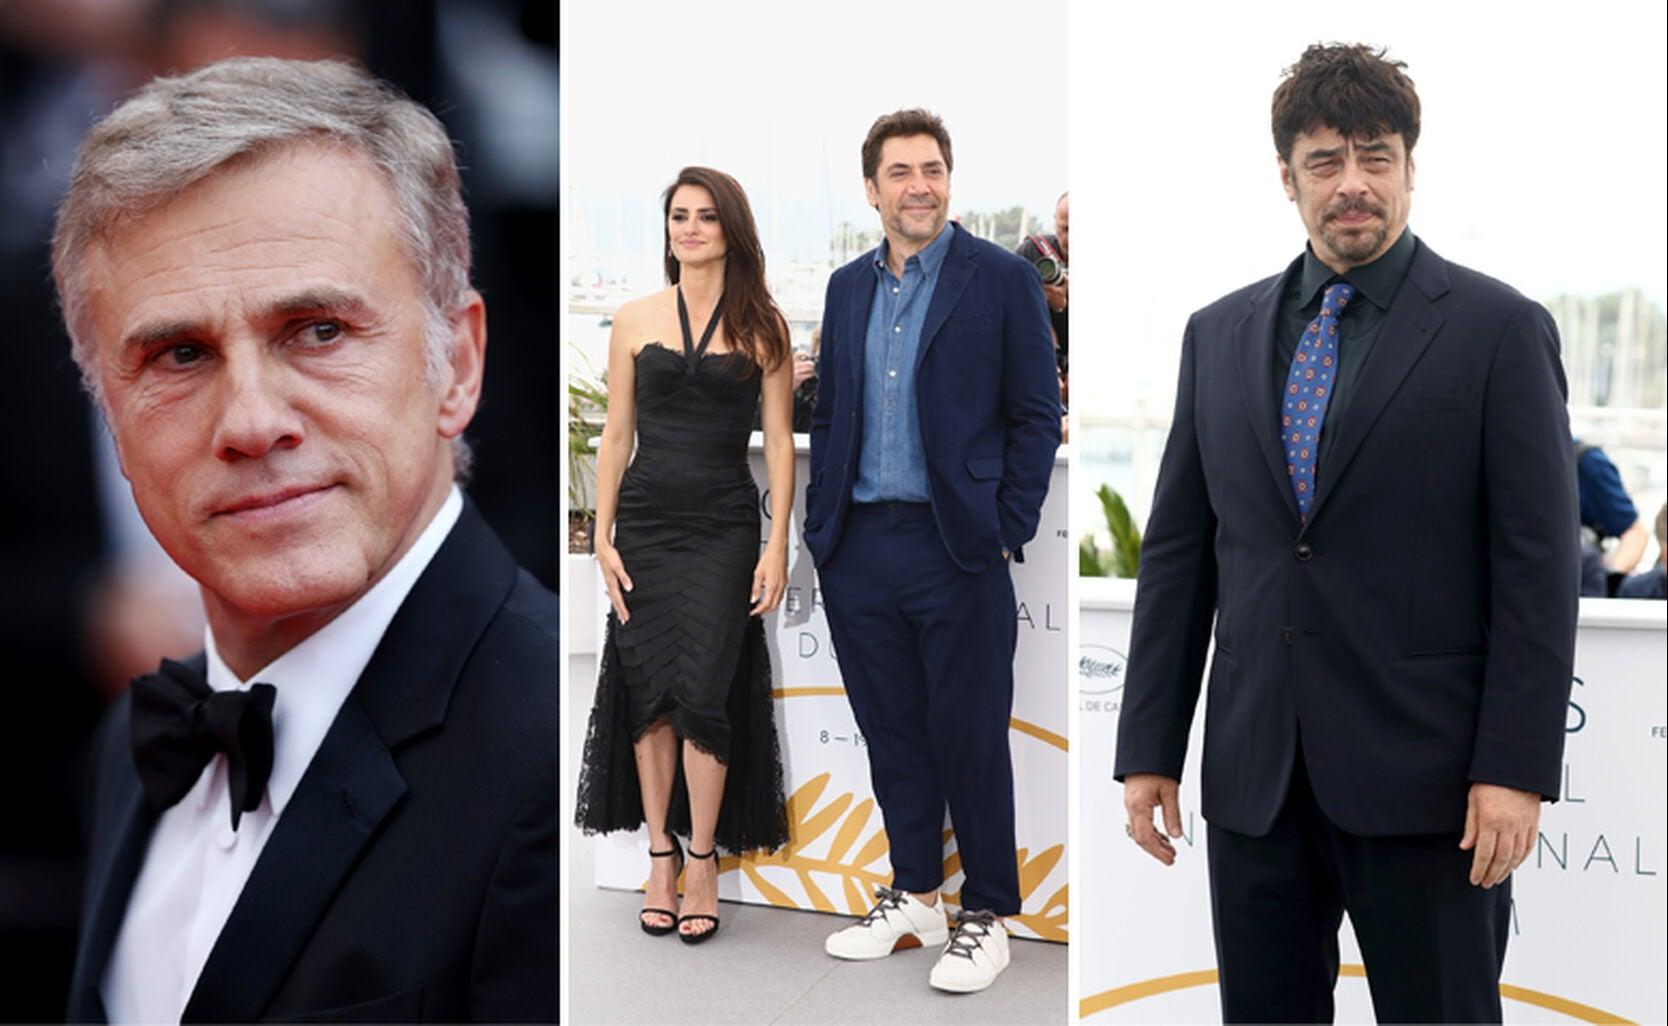 Christoph Waltz, Penelope Cruz with Javier Bardem, Benicio Del Toro